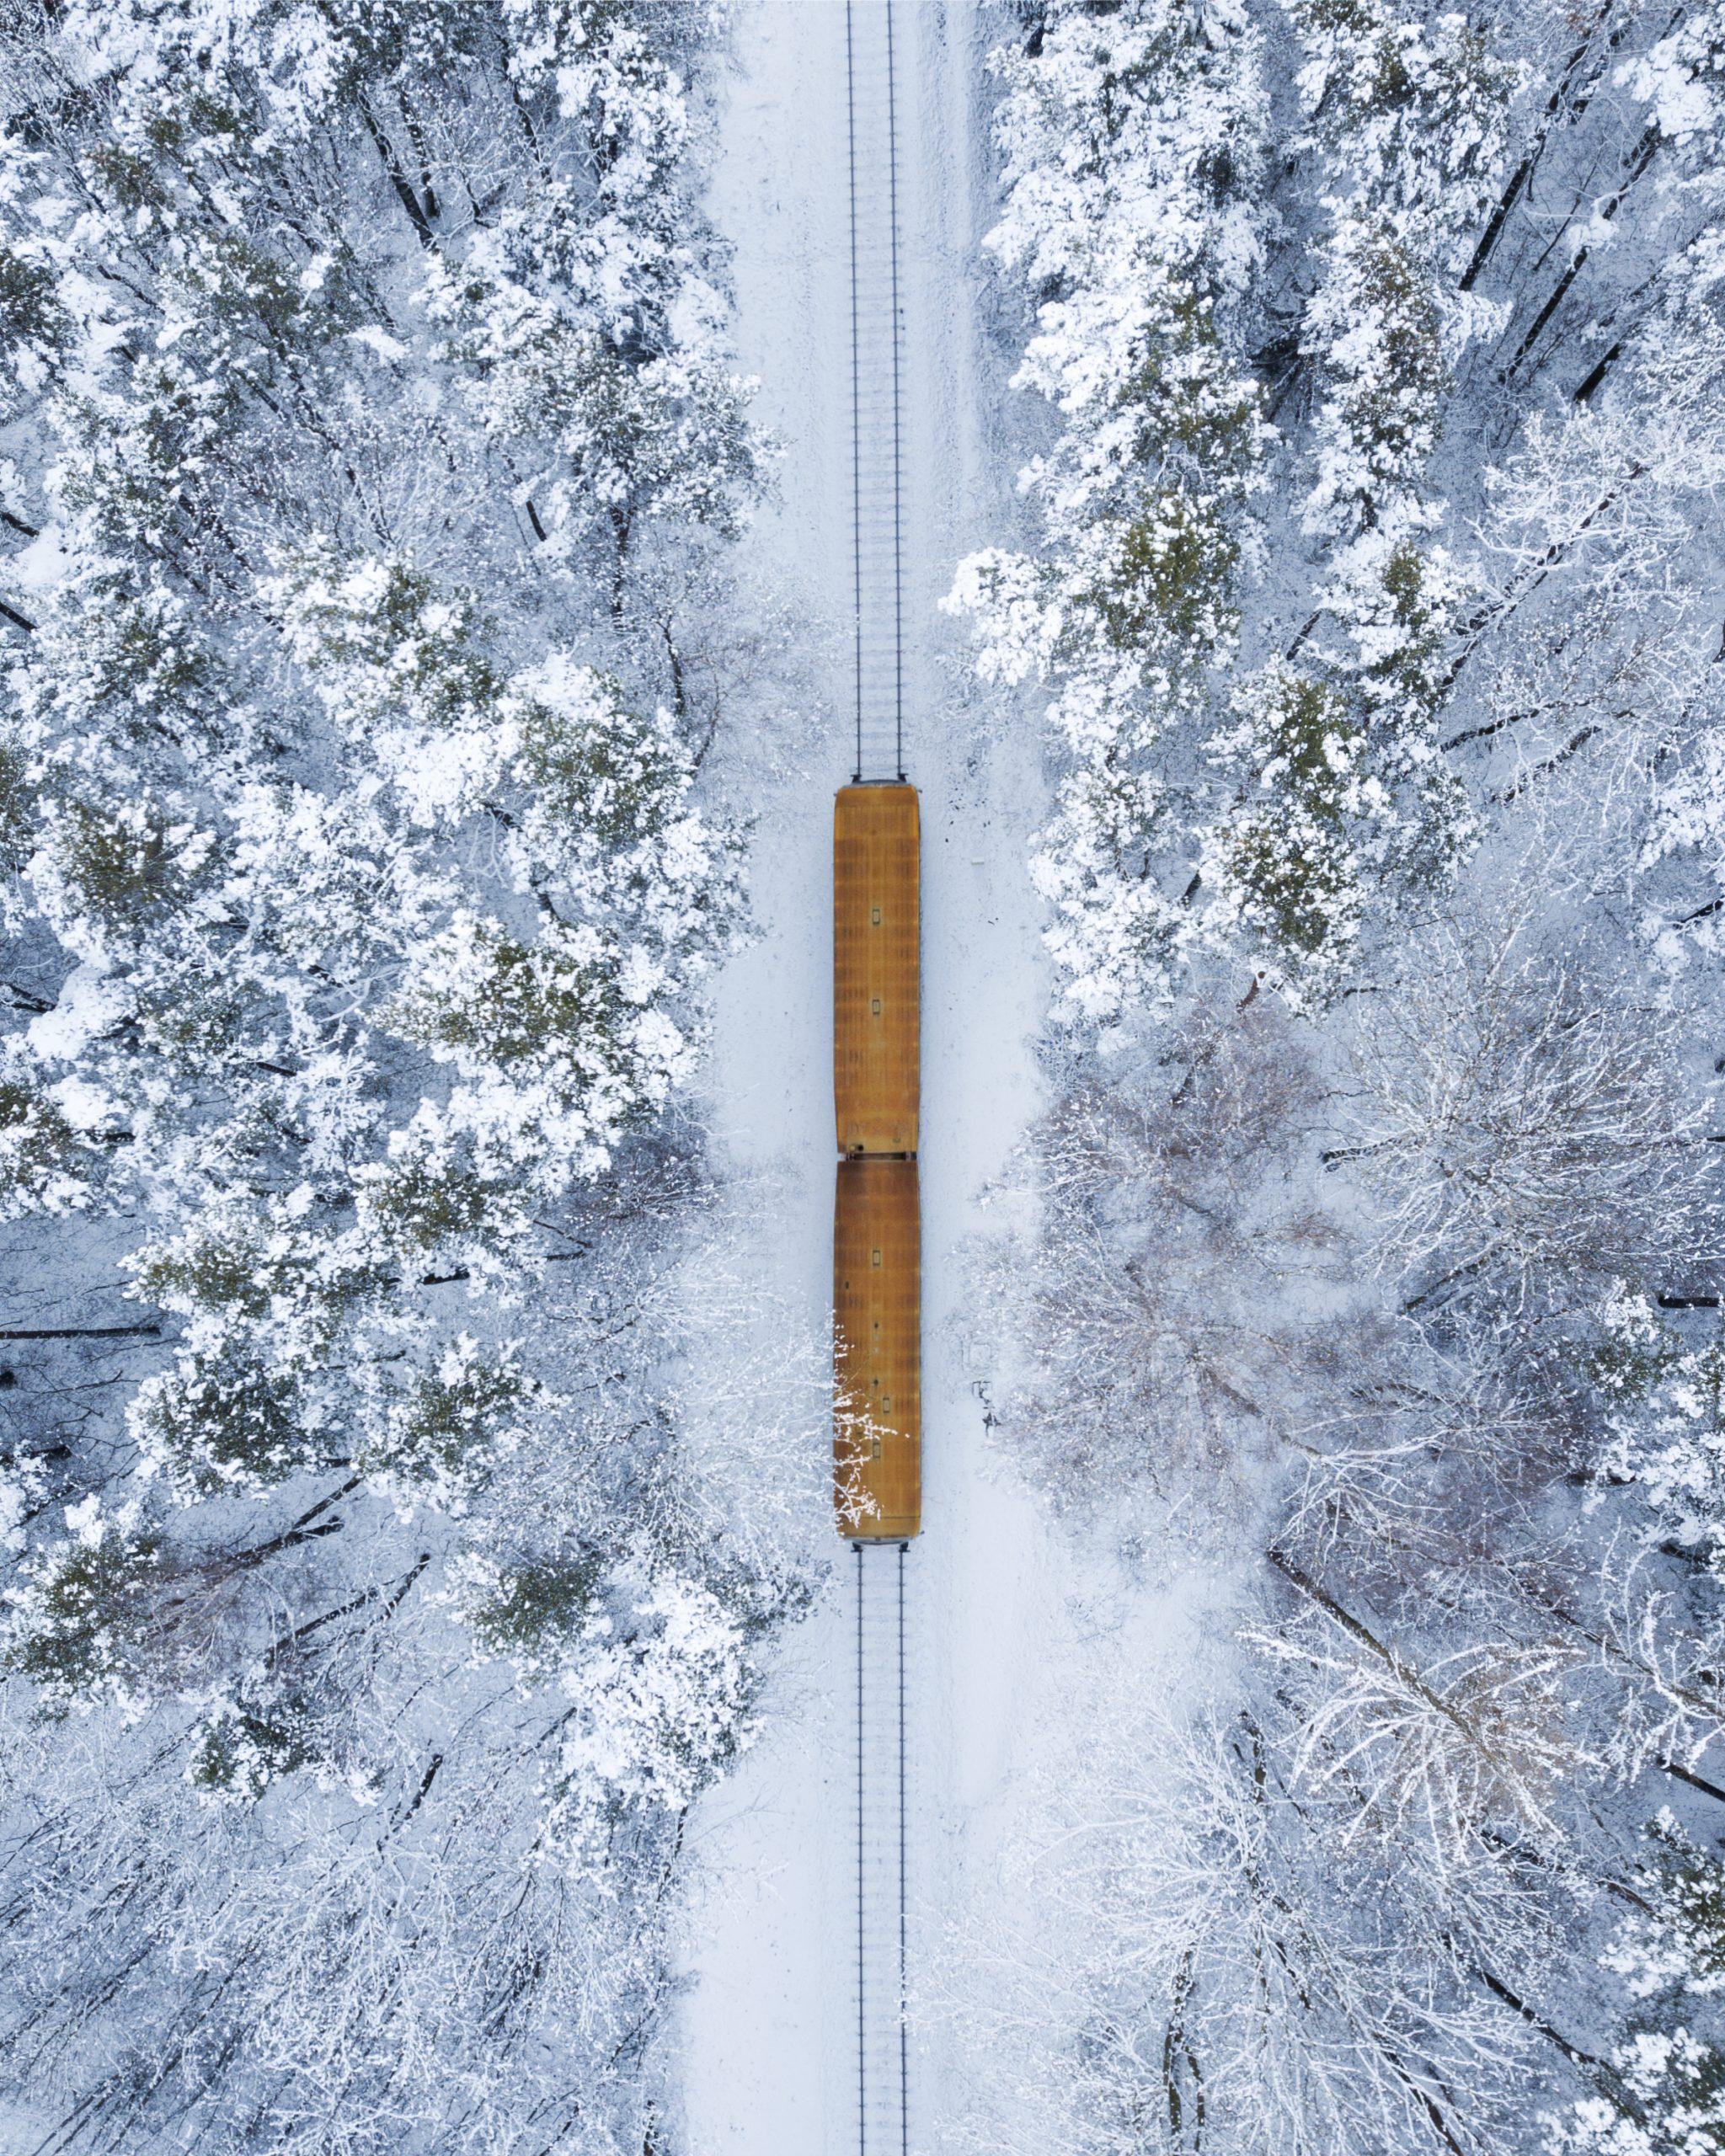 Train Czech countryside